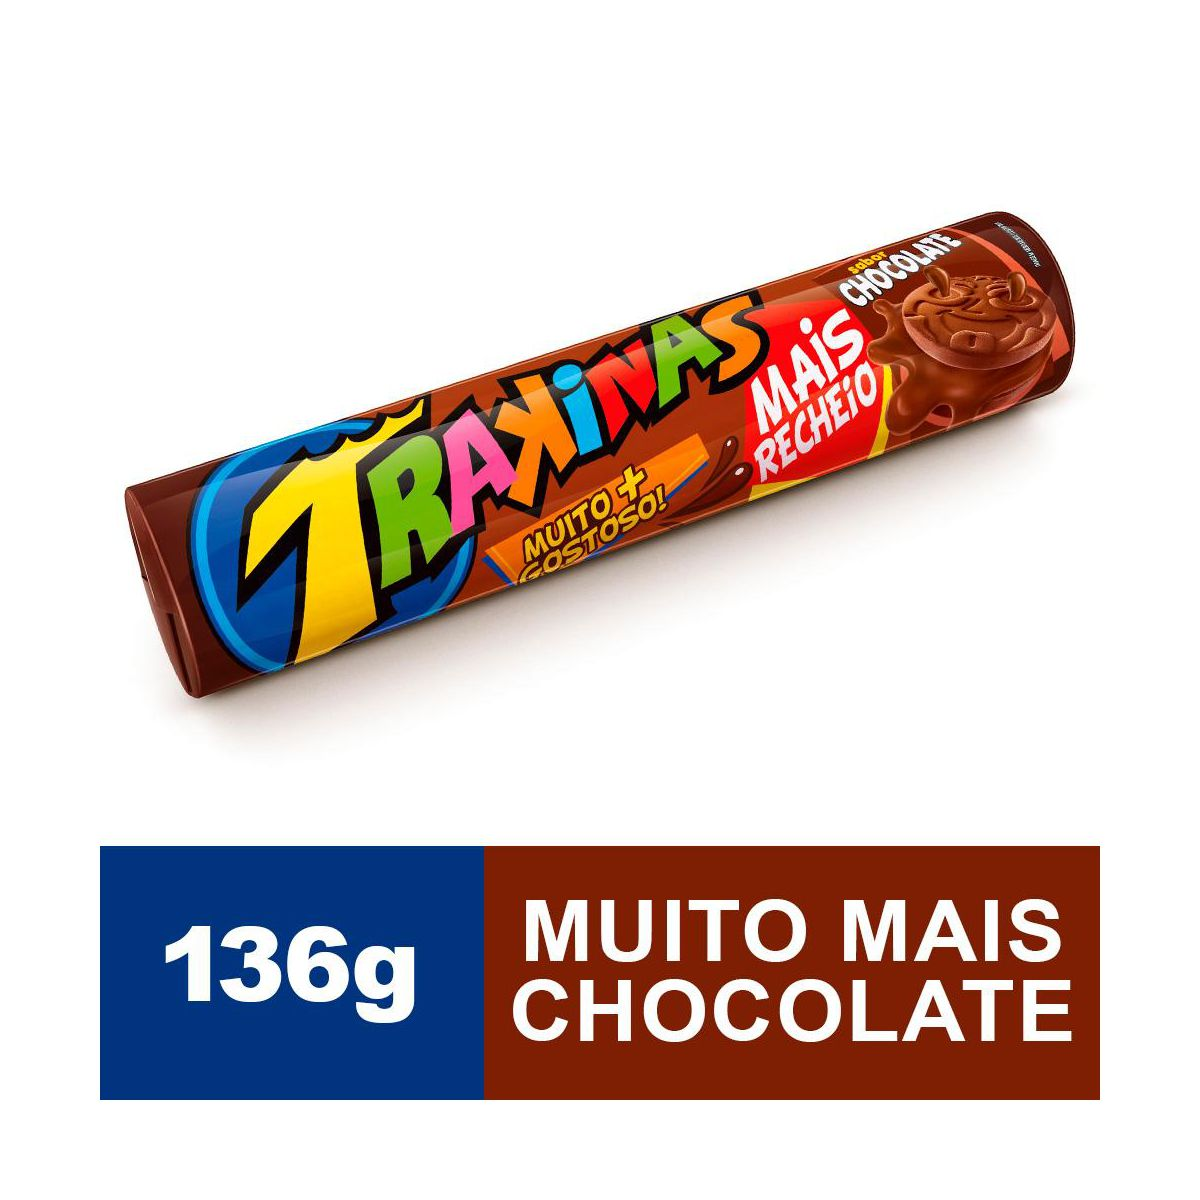 Biscoito recheado sabor chocolate mais 136g Trakinas pacote PCT